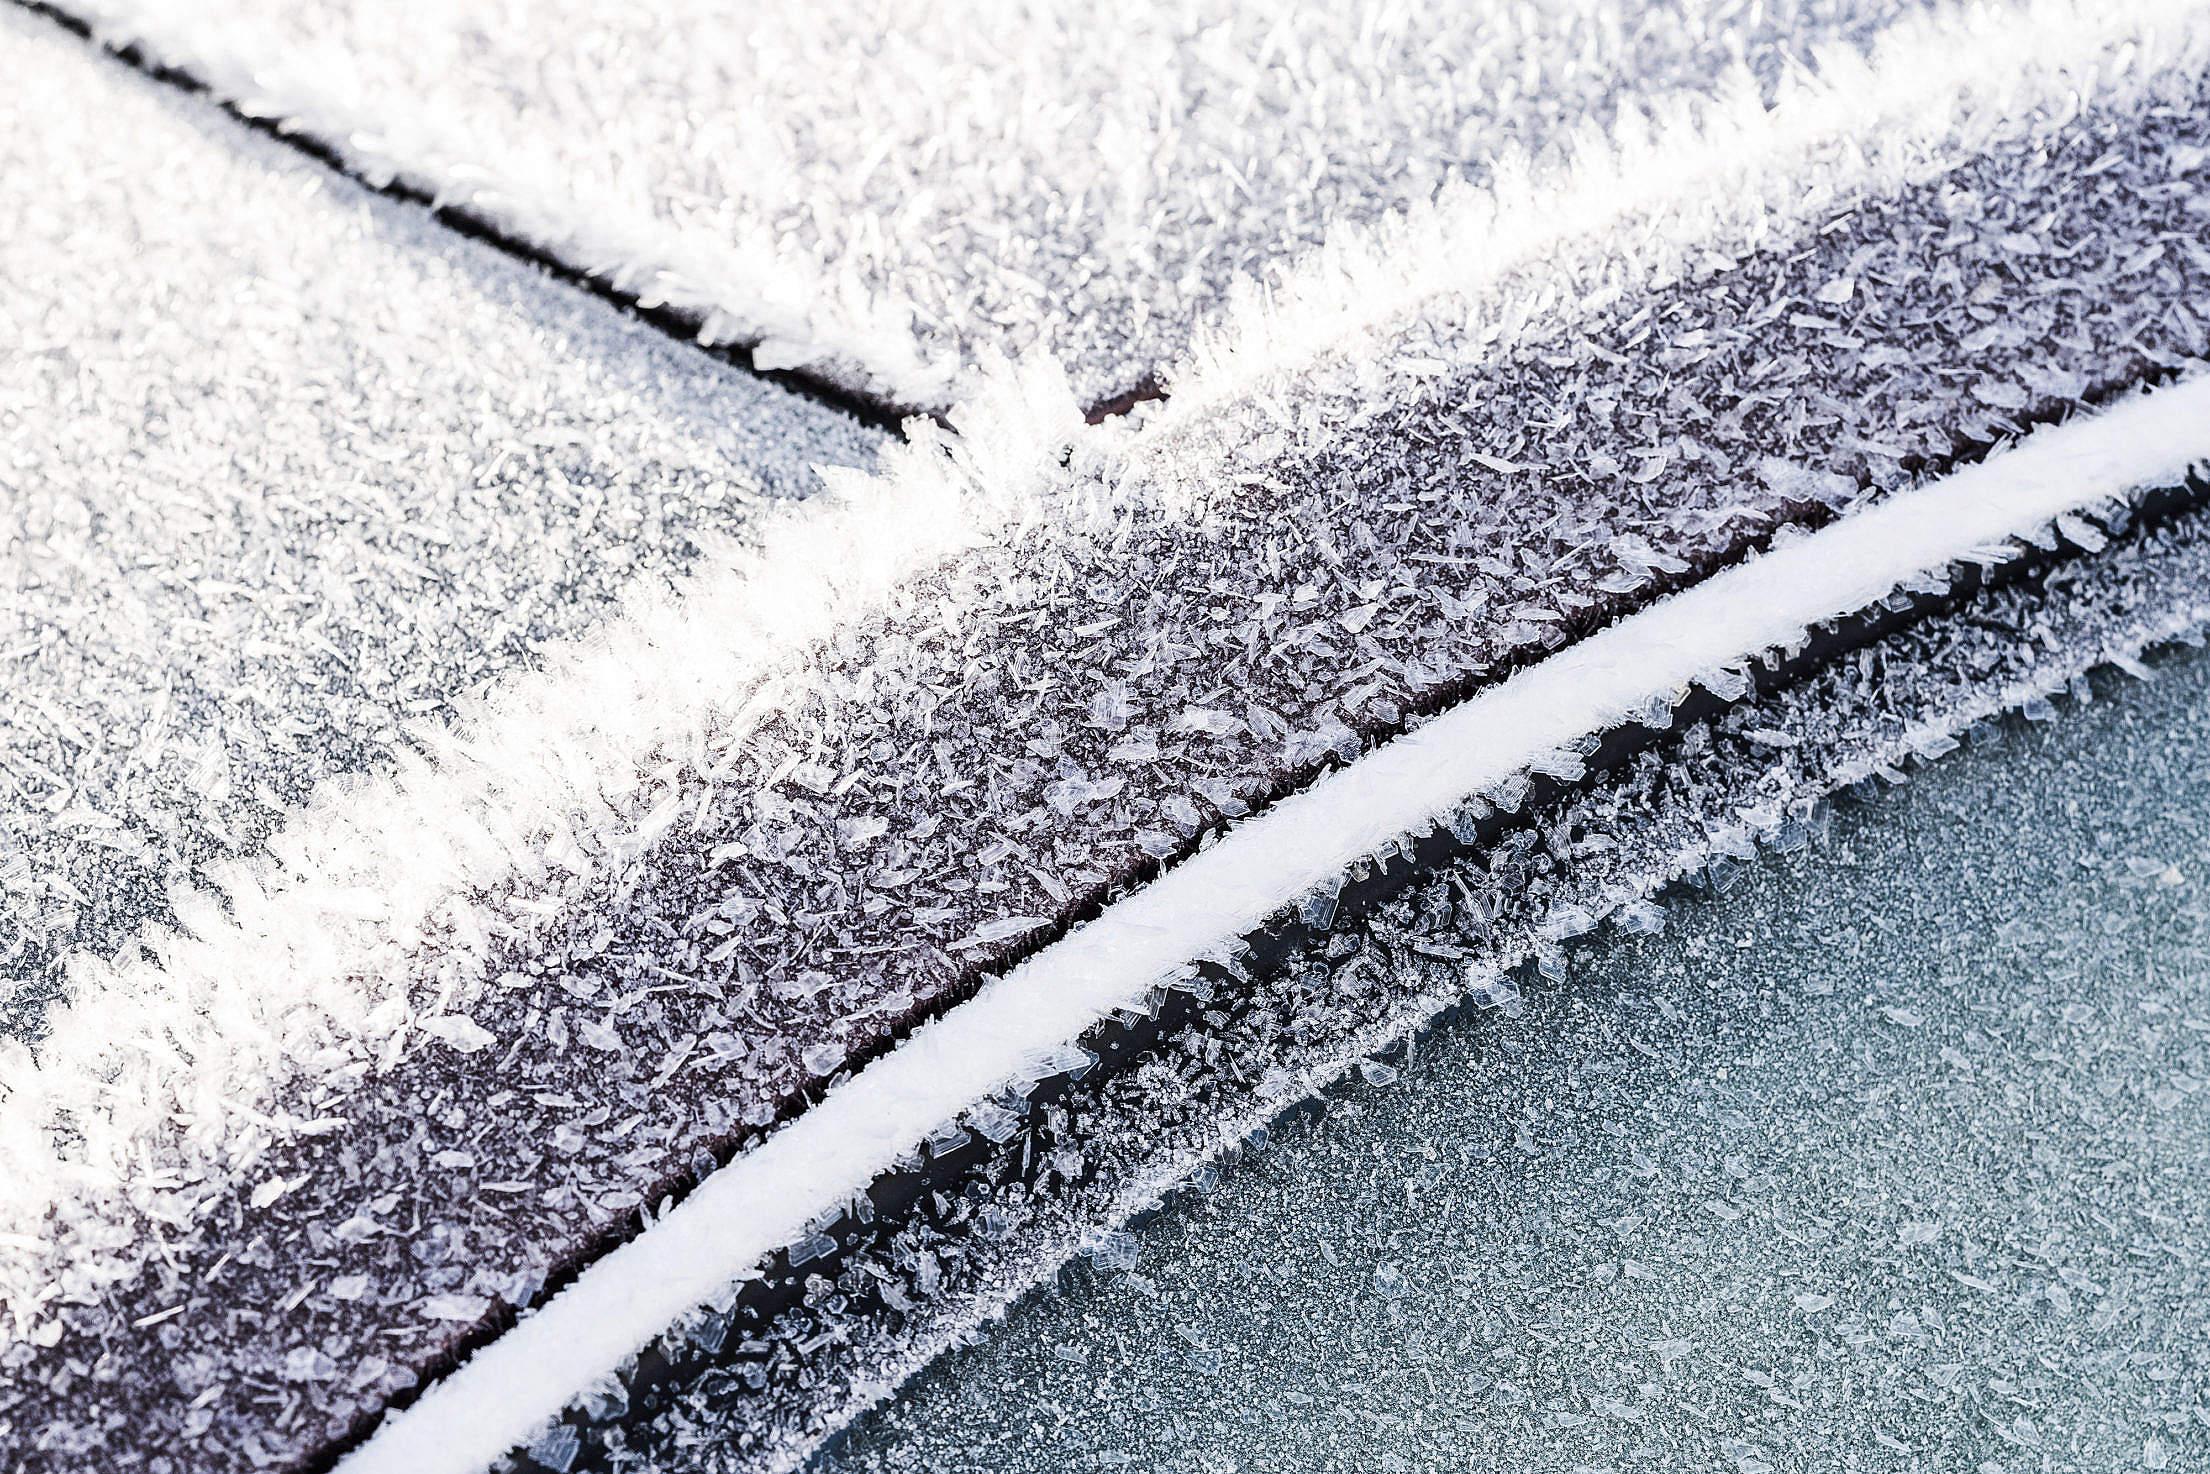 Frozen Car Windows and Doors Close Up Free Stock Photo